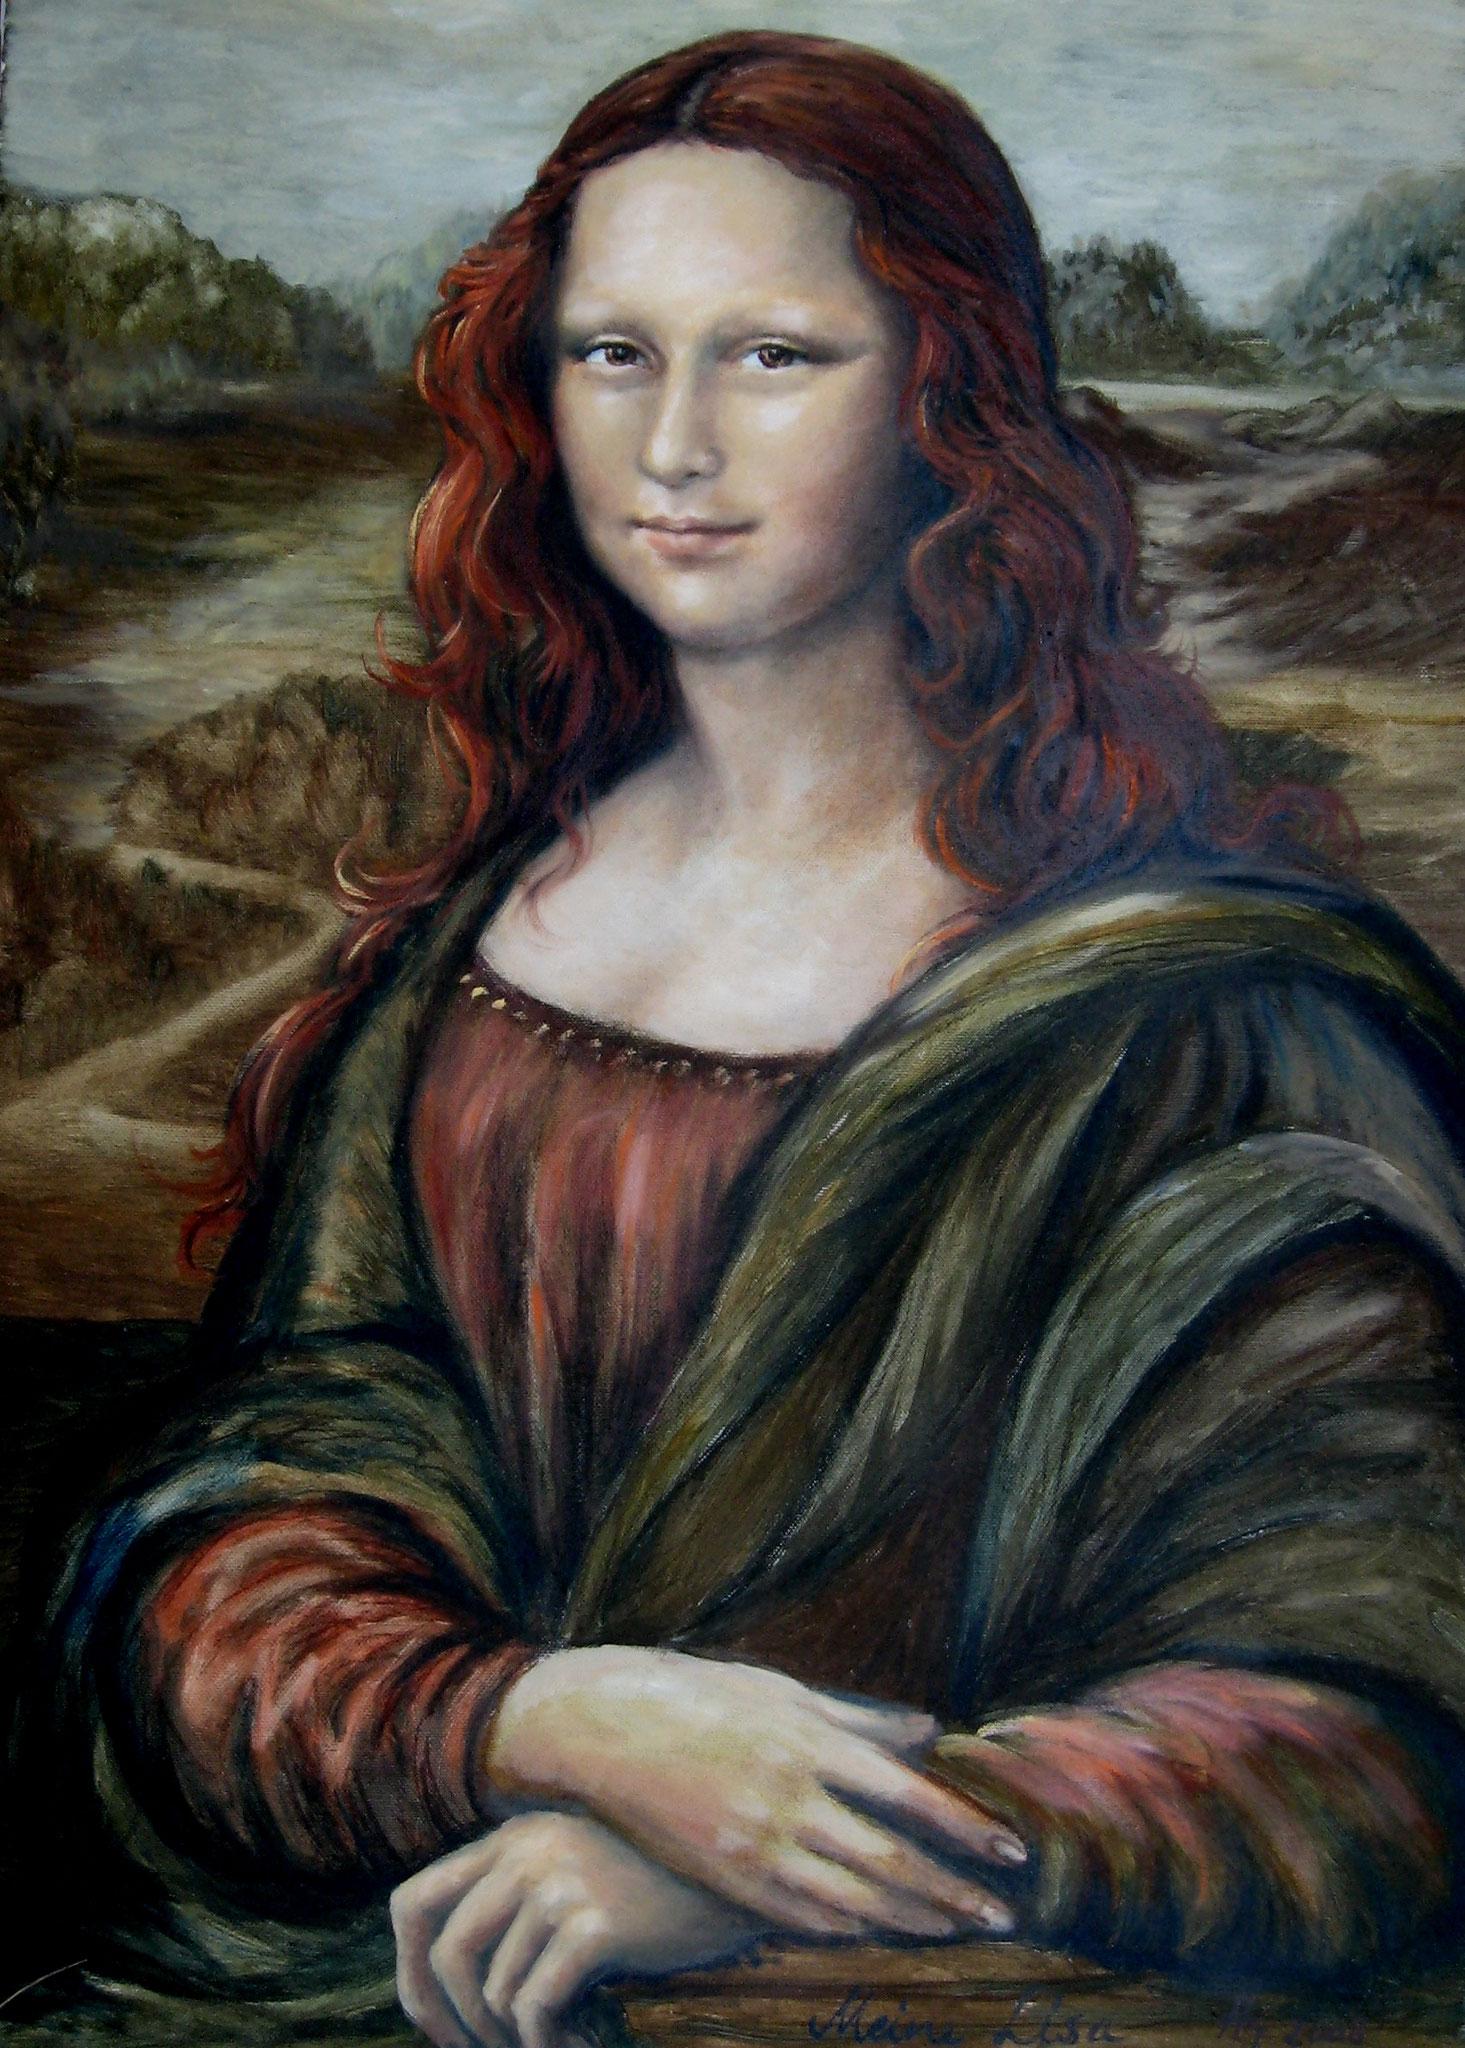 Meine Lisa, Öl auf Leinwand, 60 x 70cm, 2008